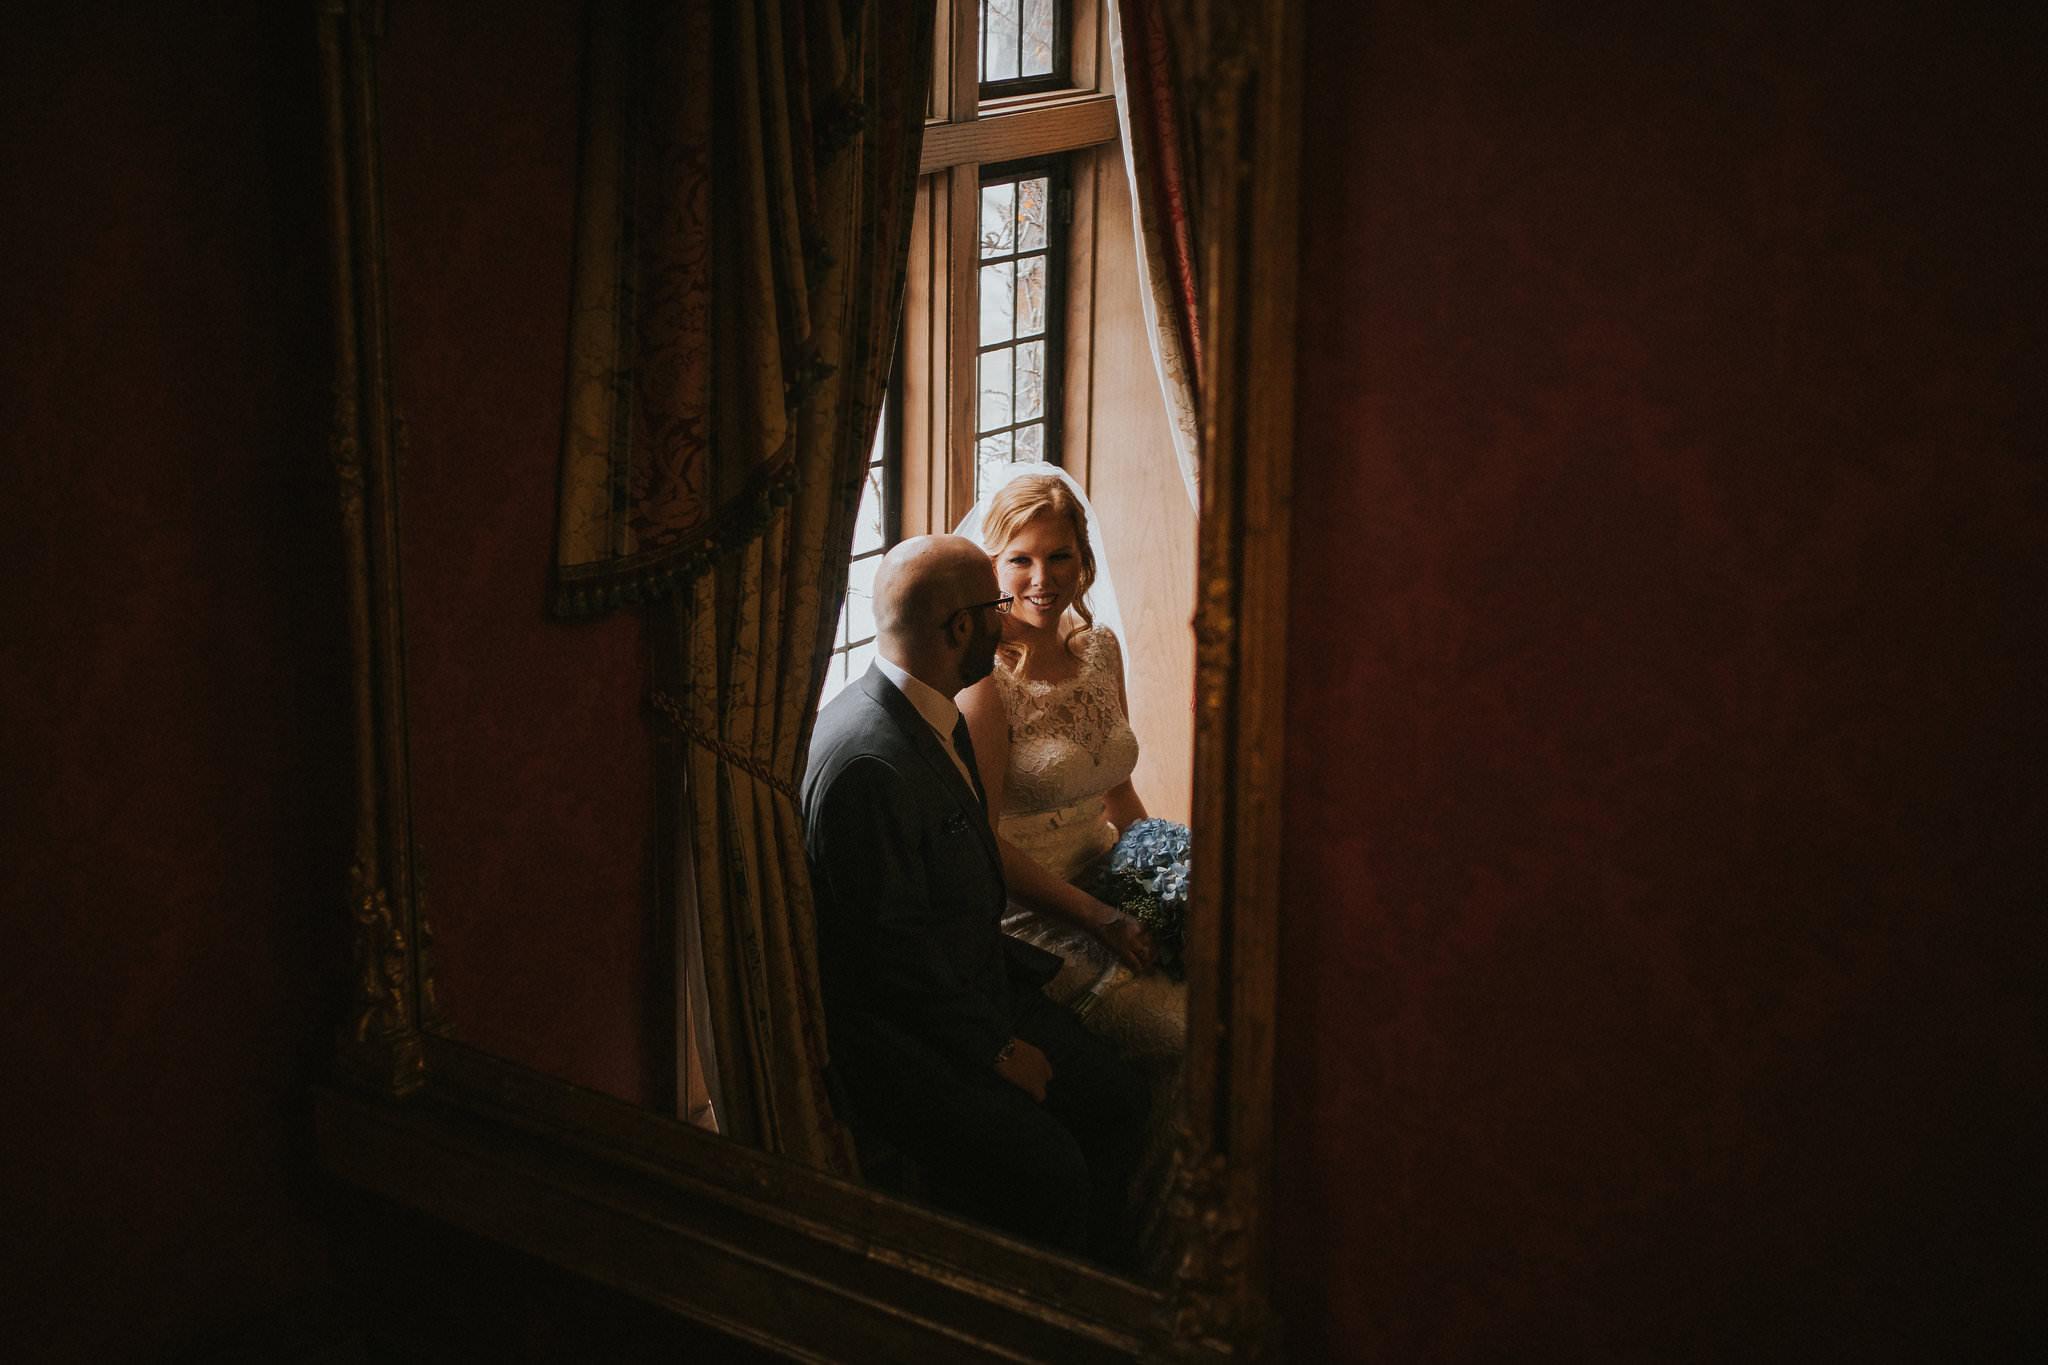 couples photos at bob rumball manor